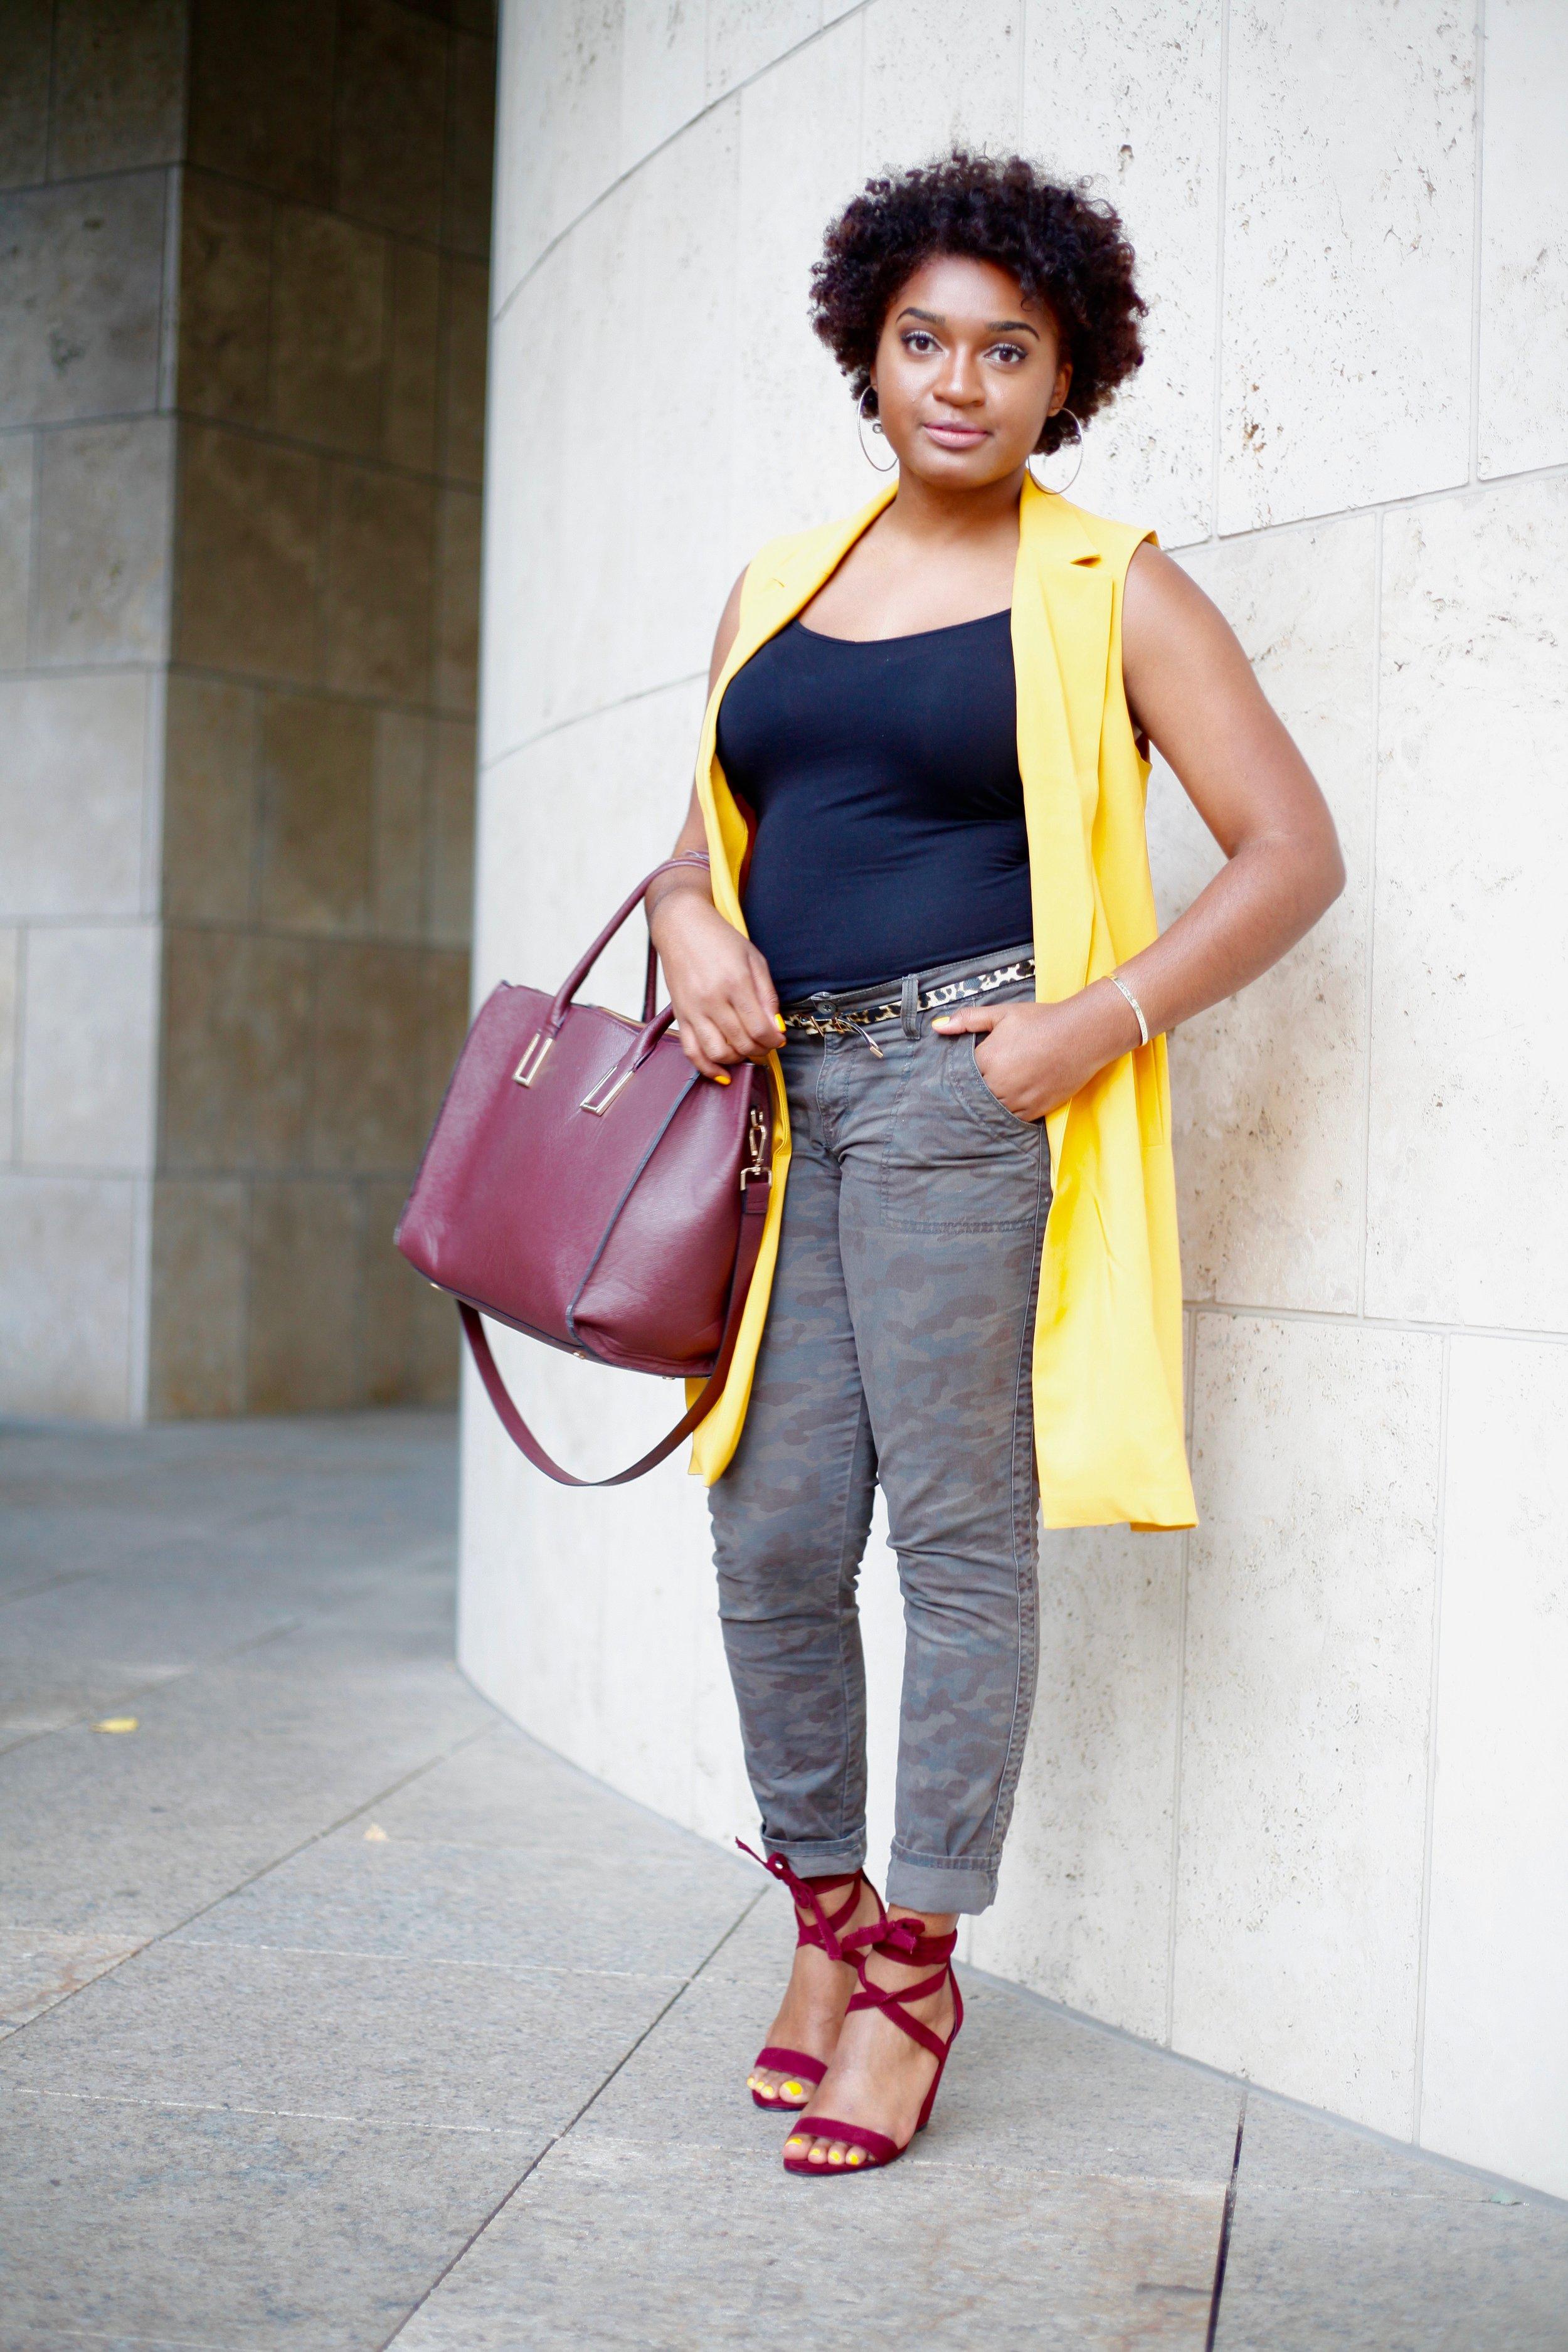 Mustard Vest + Wrap Wedge Sandals by jasmine cooper, blogger of jasminediane.com